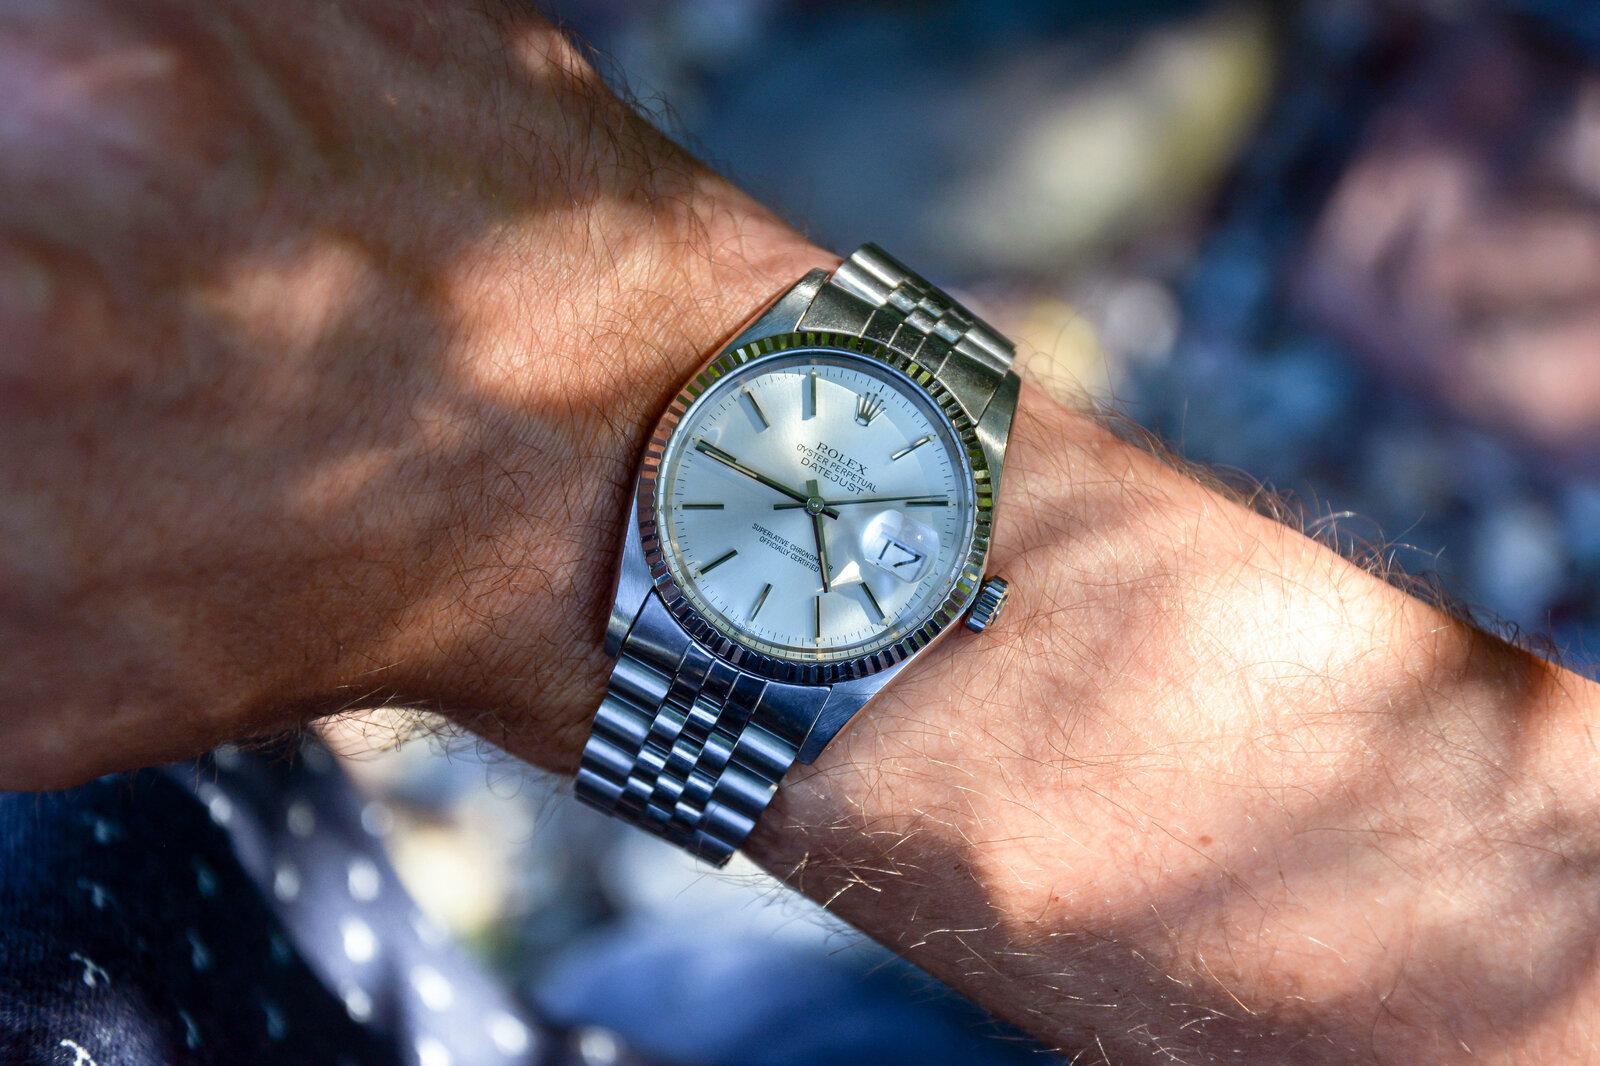 Rolex Datejust '83 Cal. 3035 ref. 16014